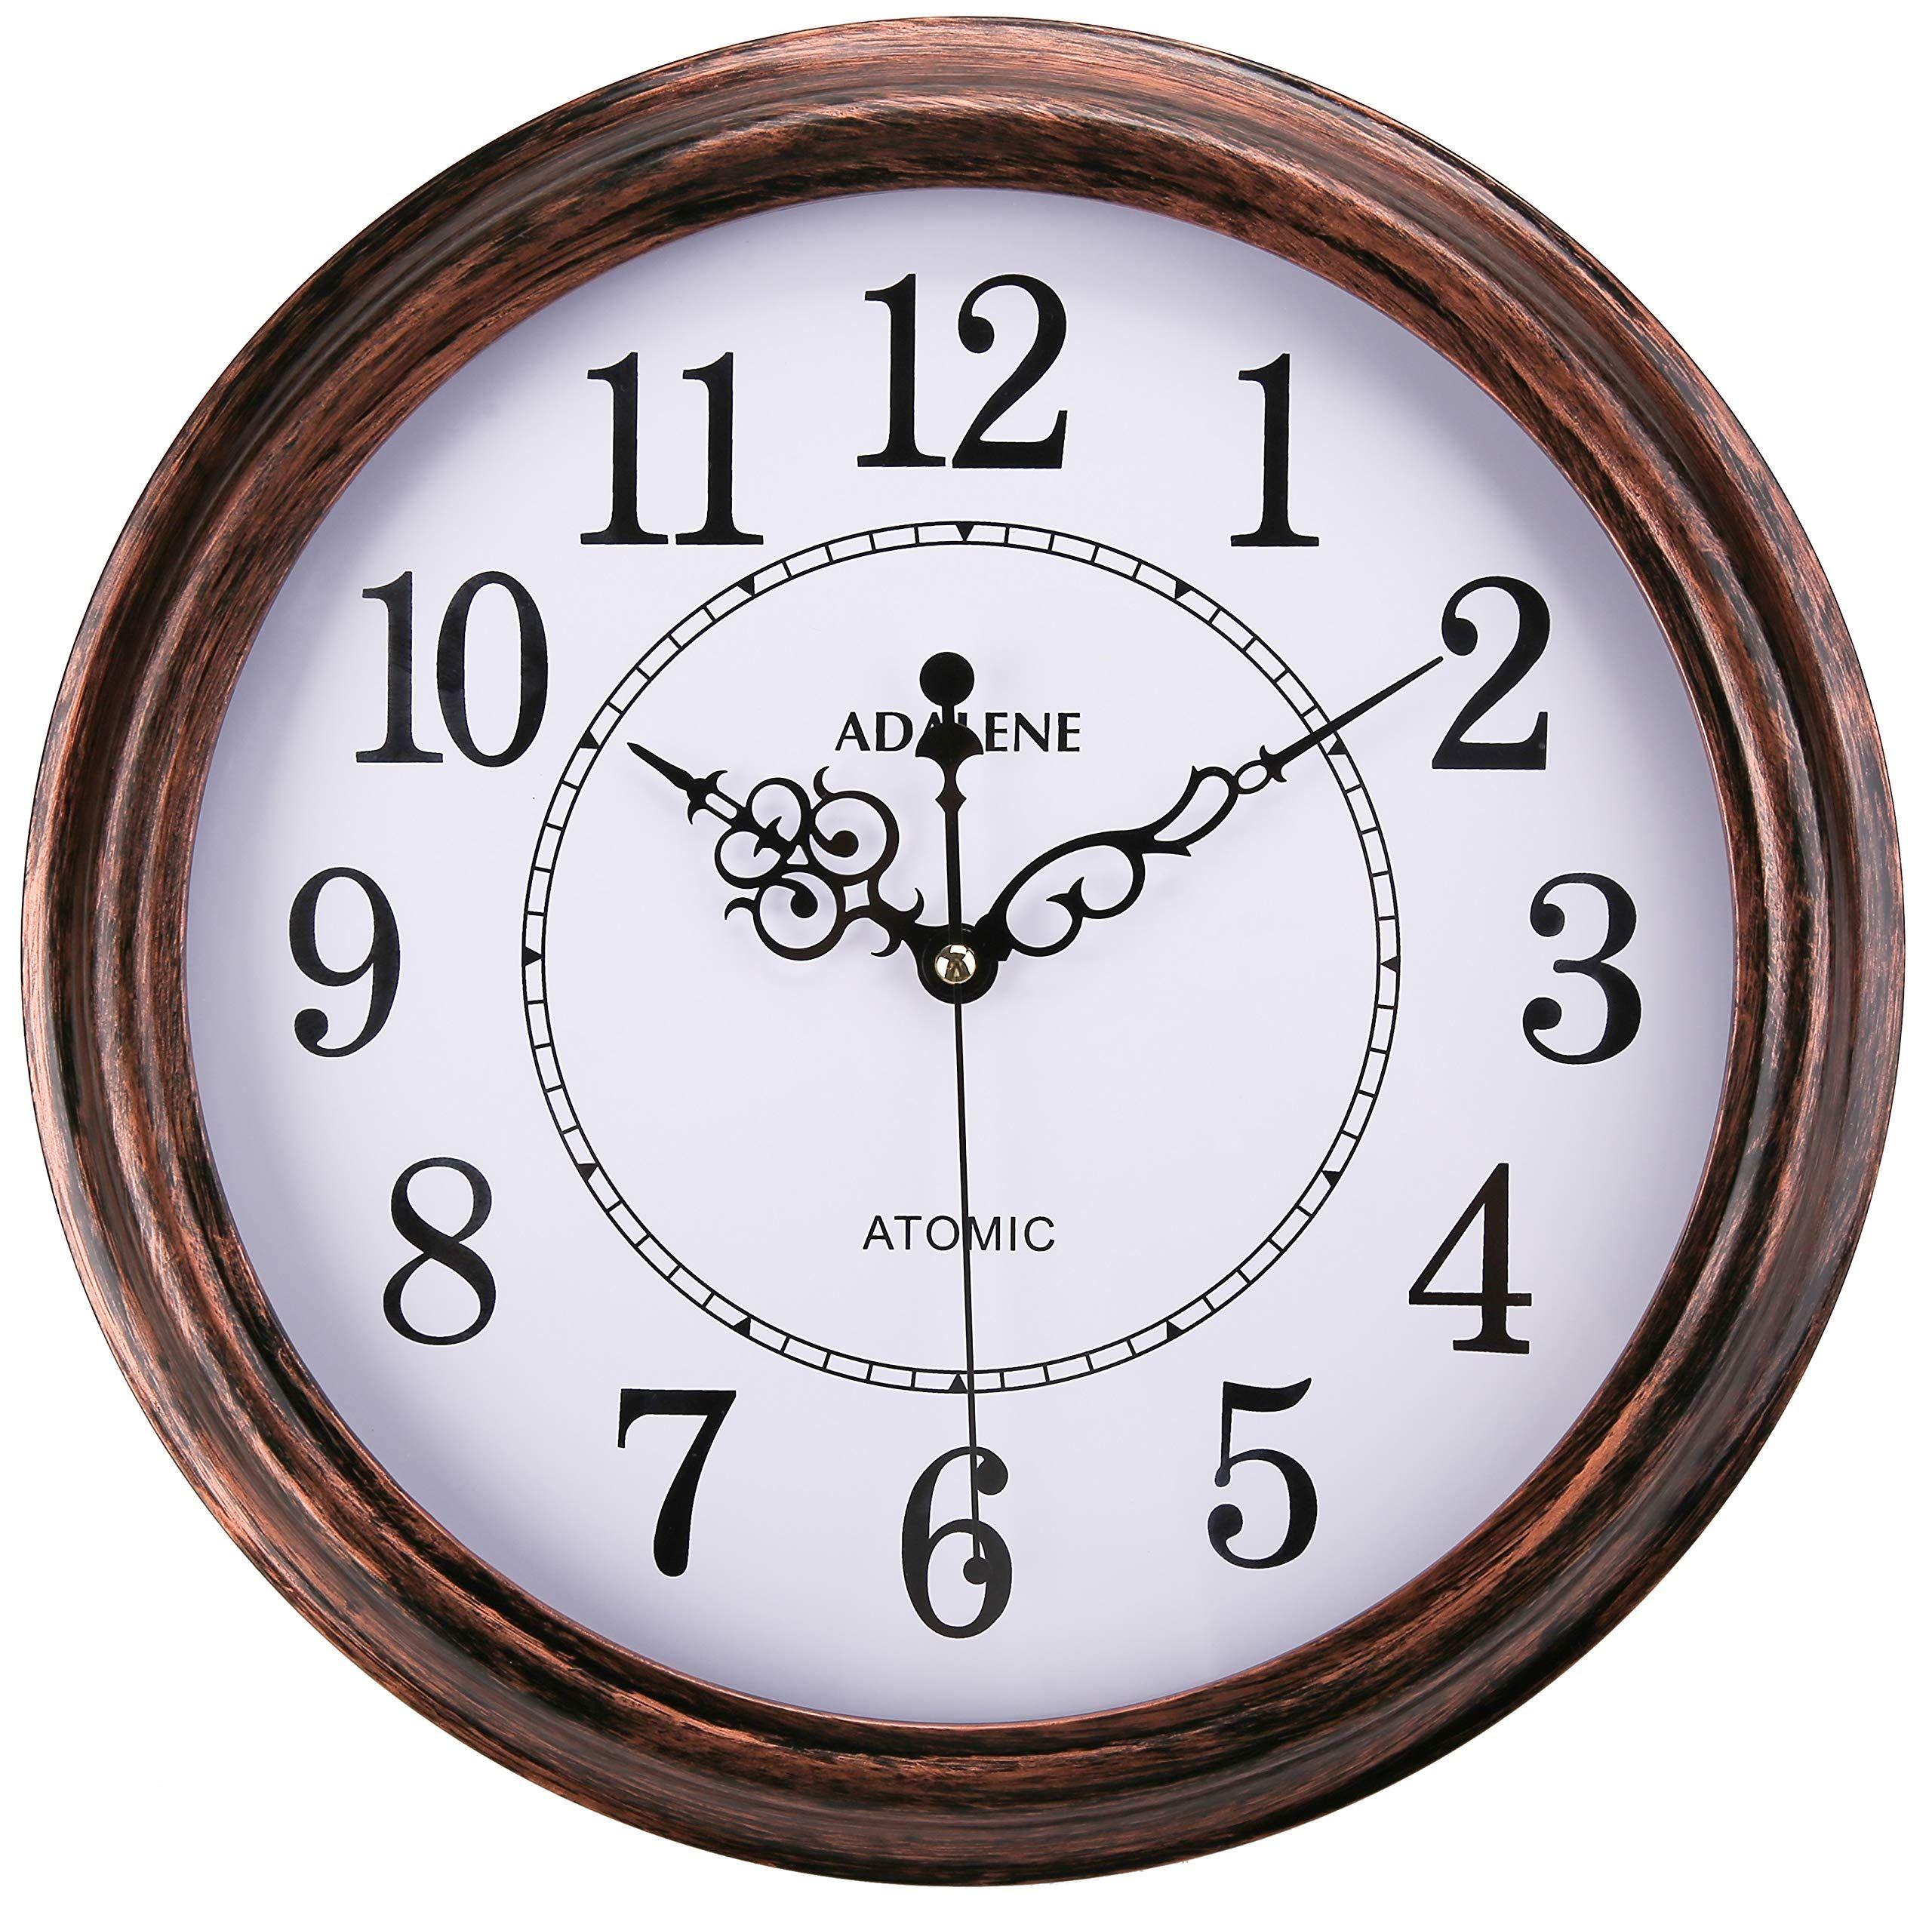 Adalene Atomic Wall Clocks Battery Operated Vintage Atomic Clock